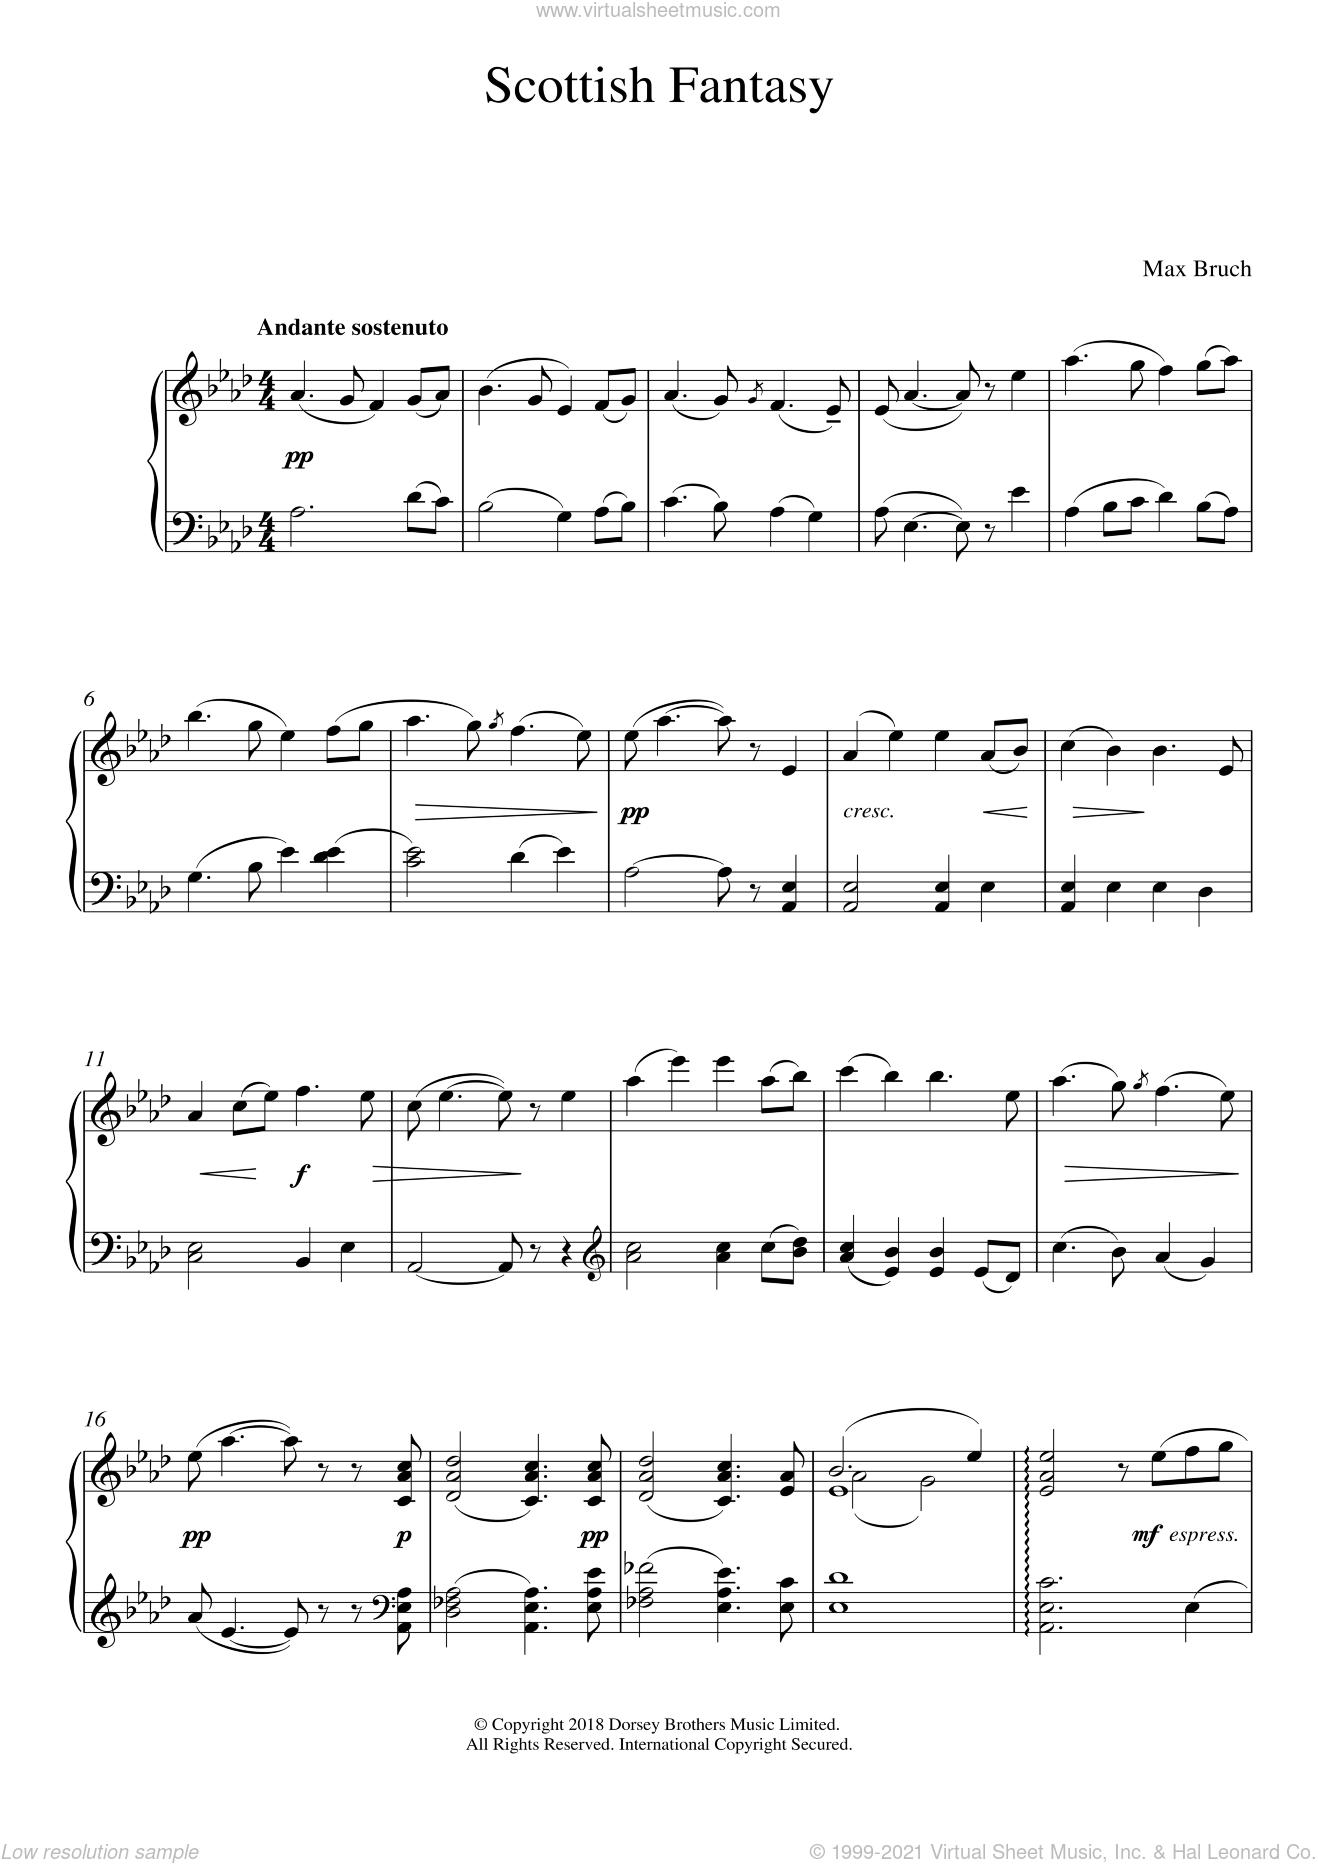 Scottish Fantasy, Op. 46 sheet music for piano solo by Max Bruch, classical score, intermediate skill level